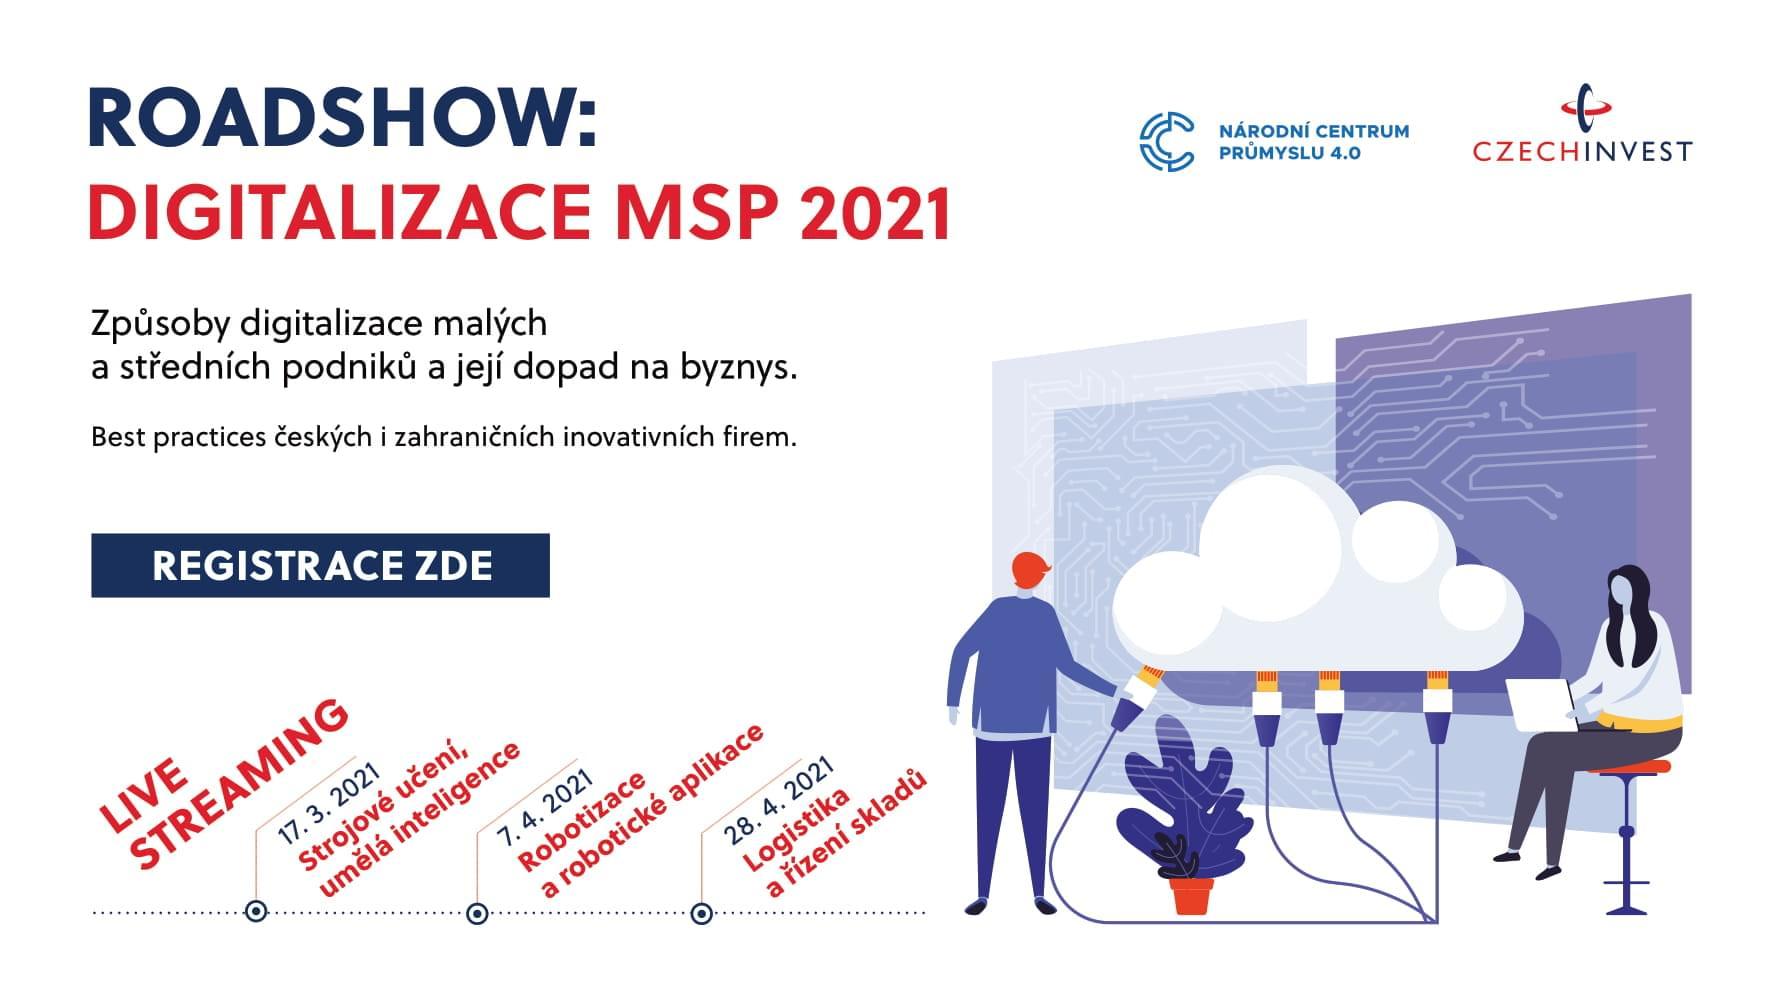 200618 cg czechinvest roadshow 2021 03 1